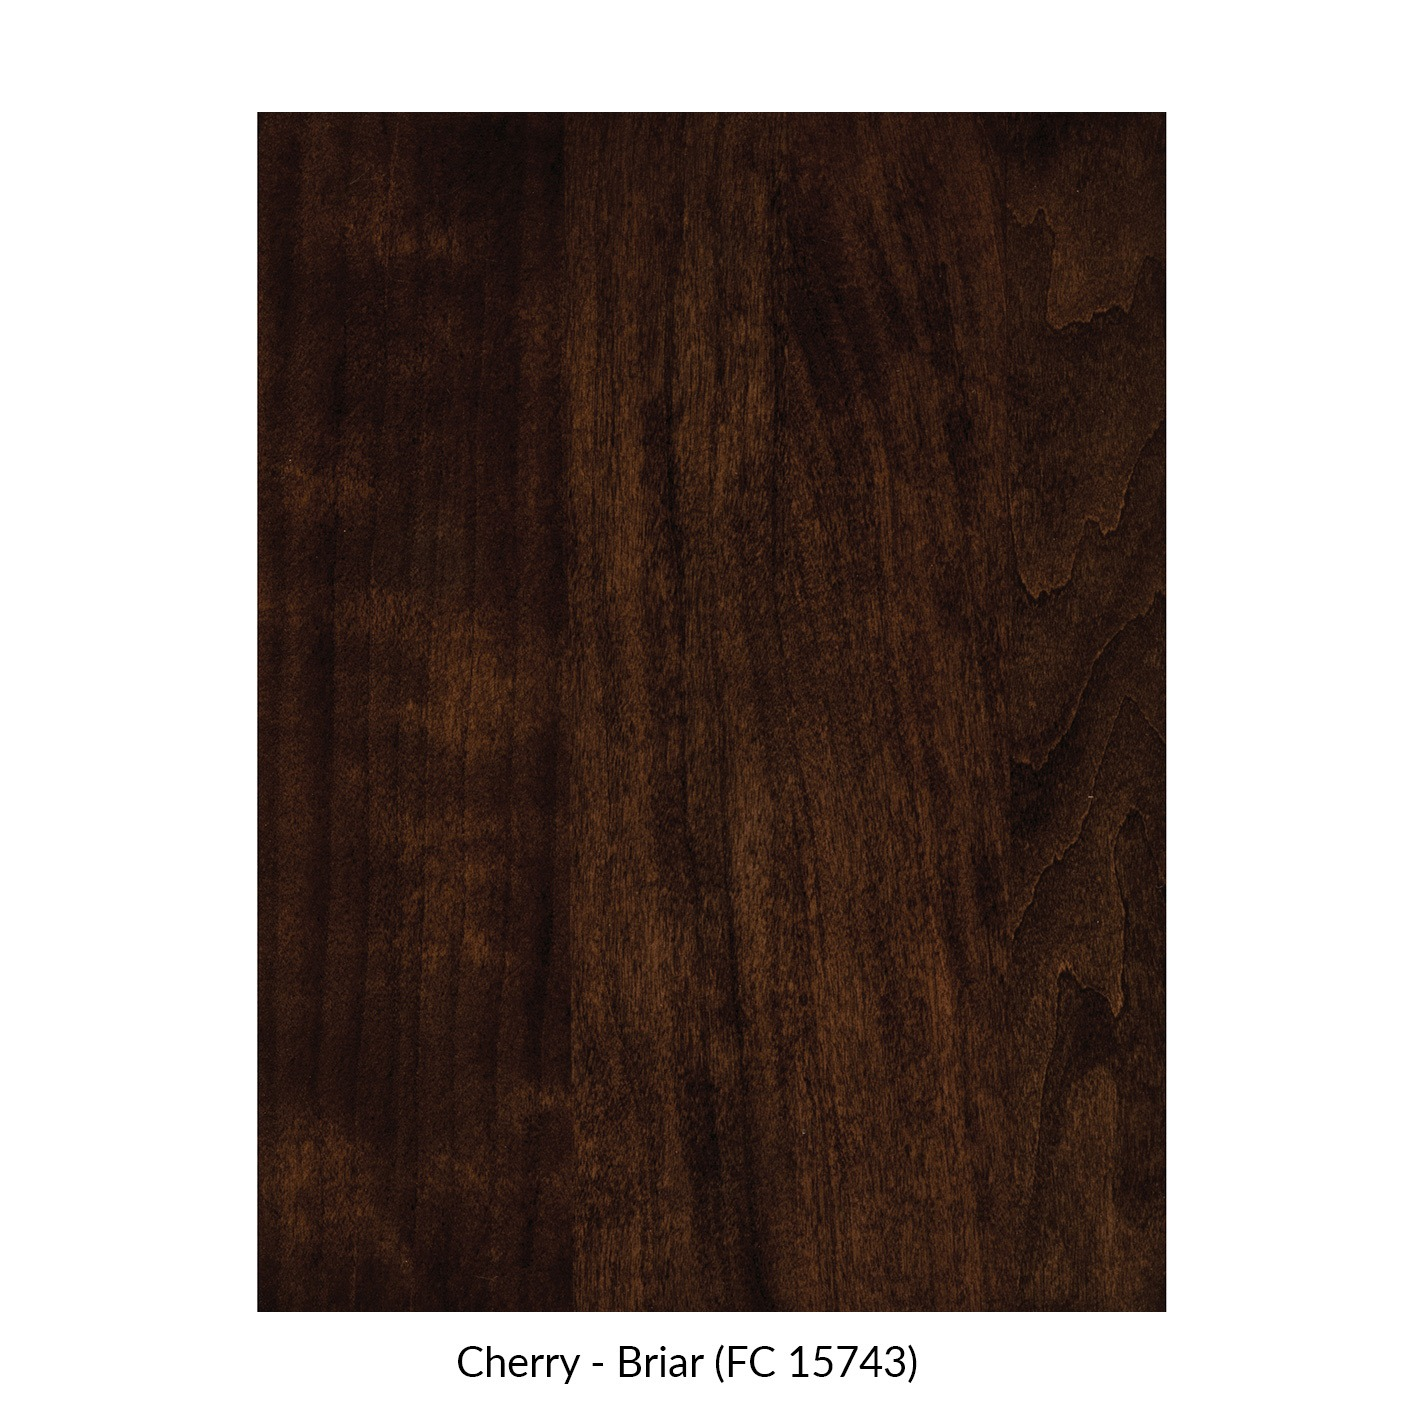 spectrum-cherry-briar-fc-15743.jpg